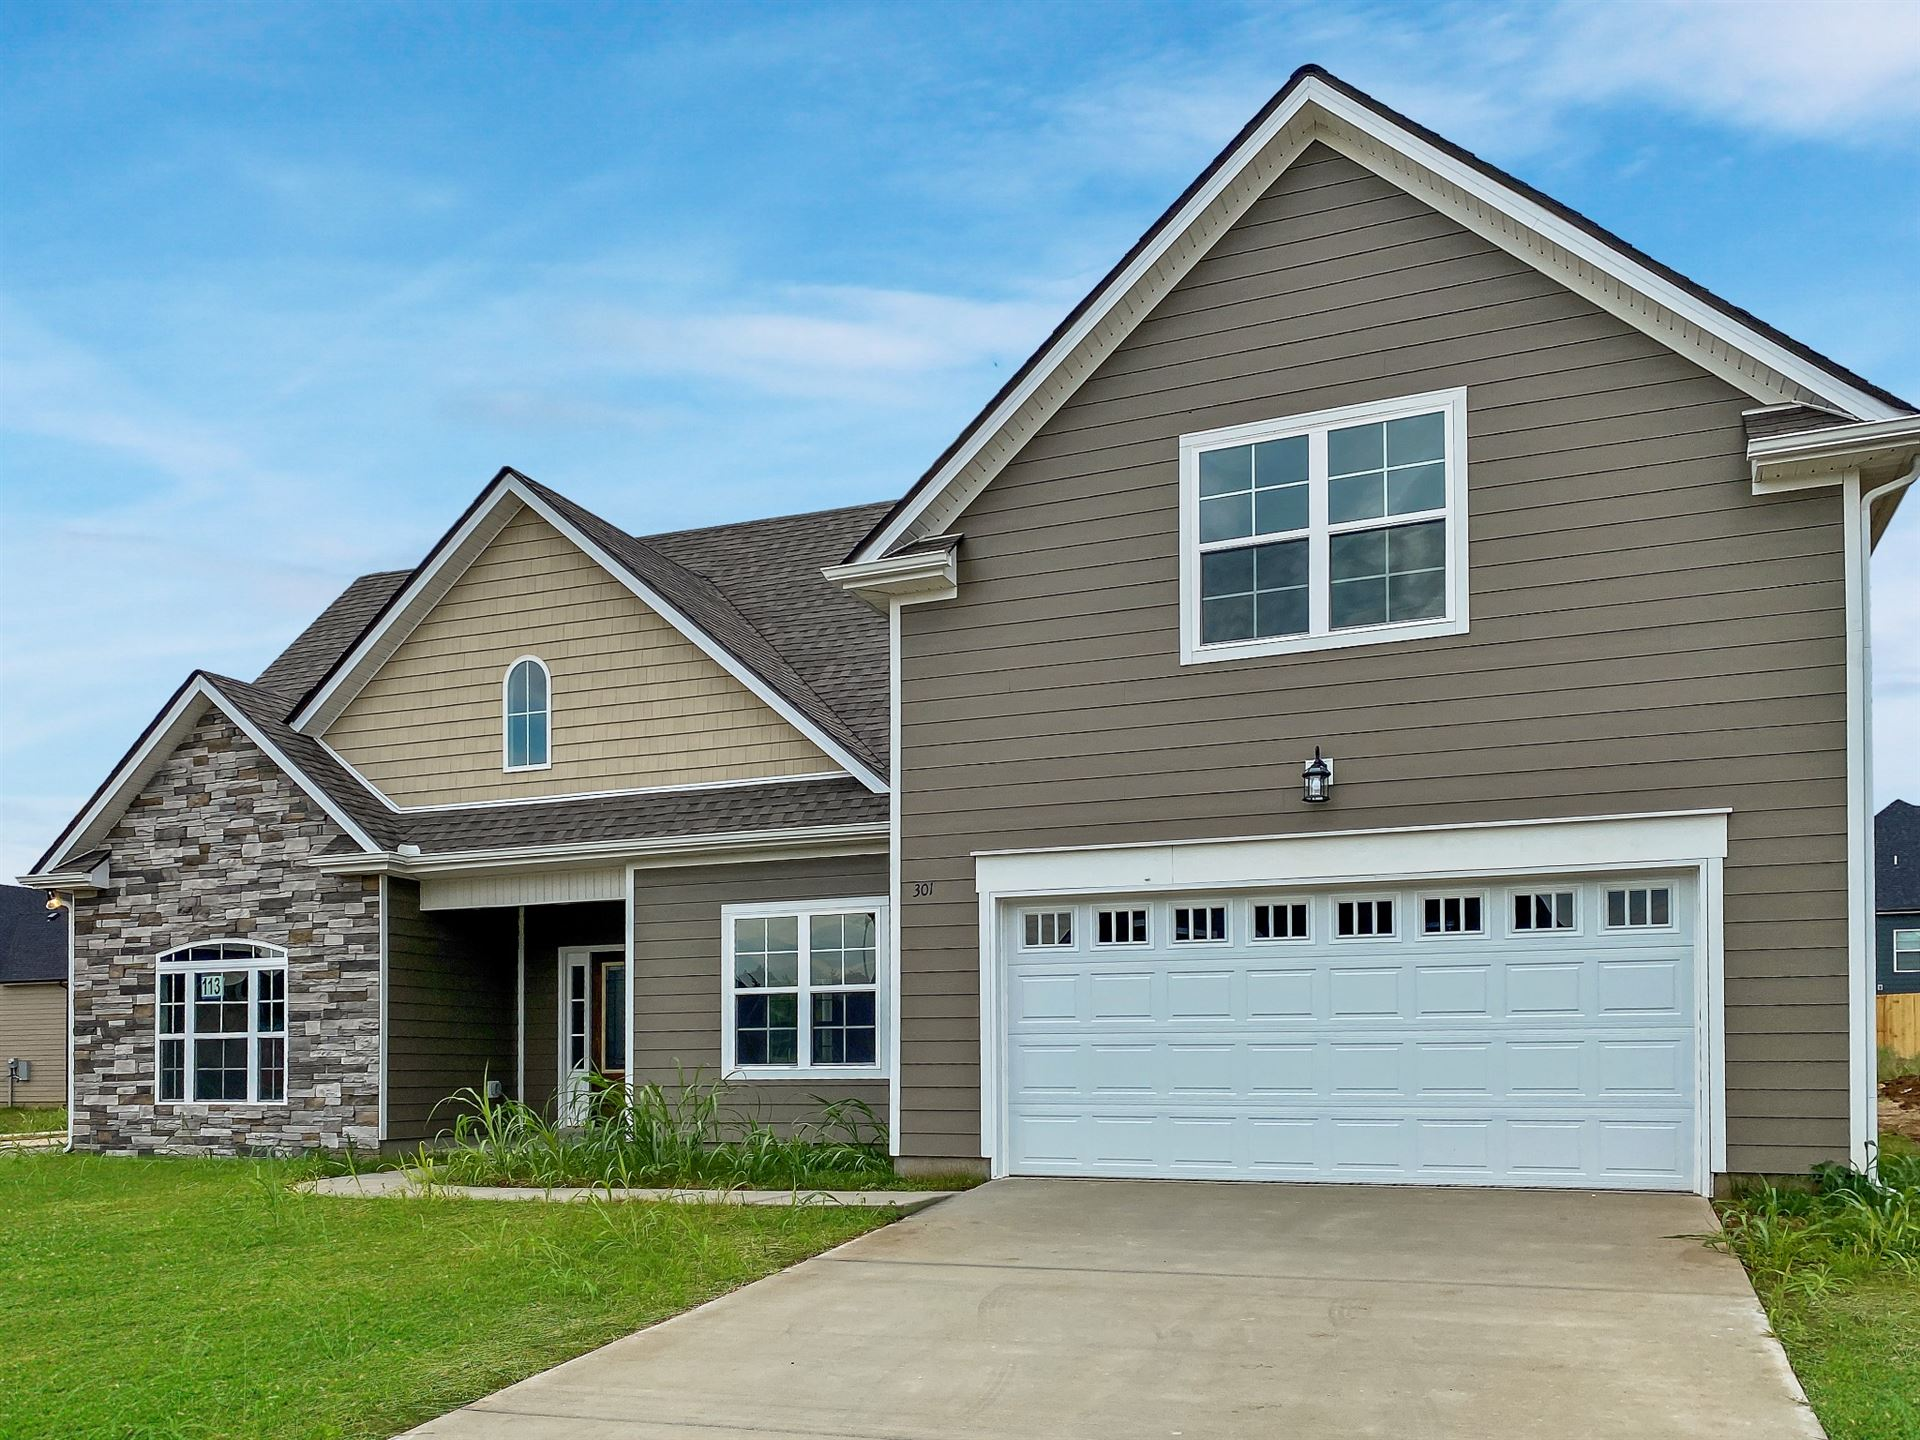 301 Prosperous Ln, 113, Smyrna, TN 37167 - MLS#: 2171587